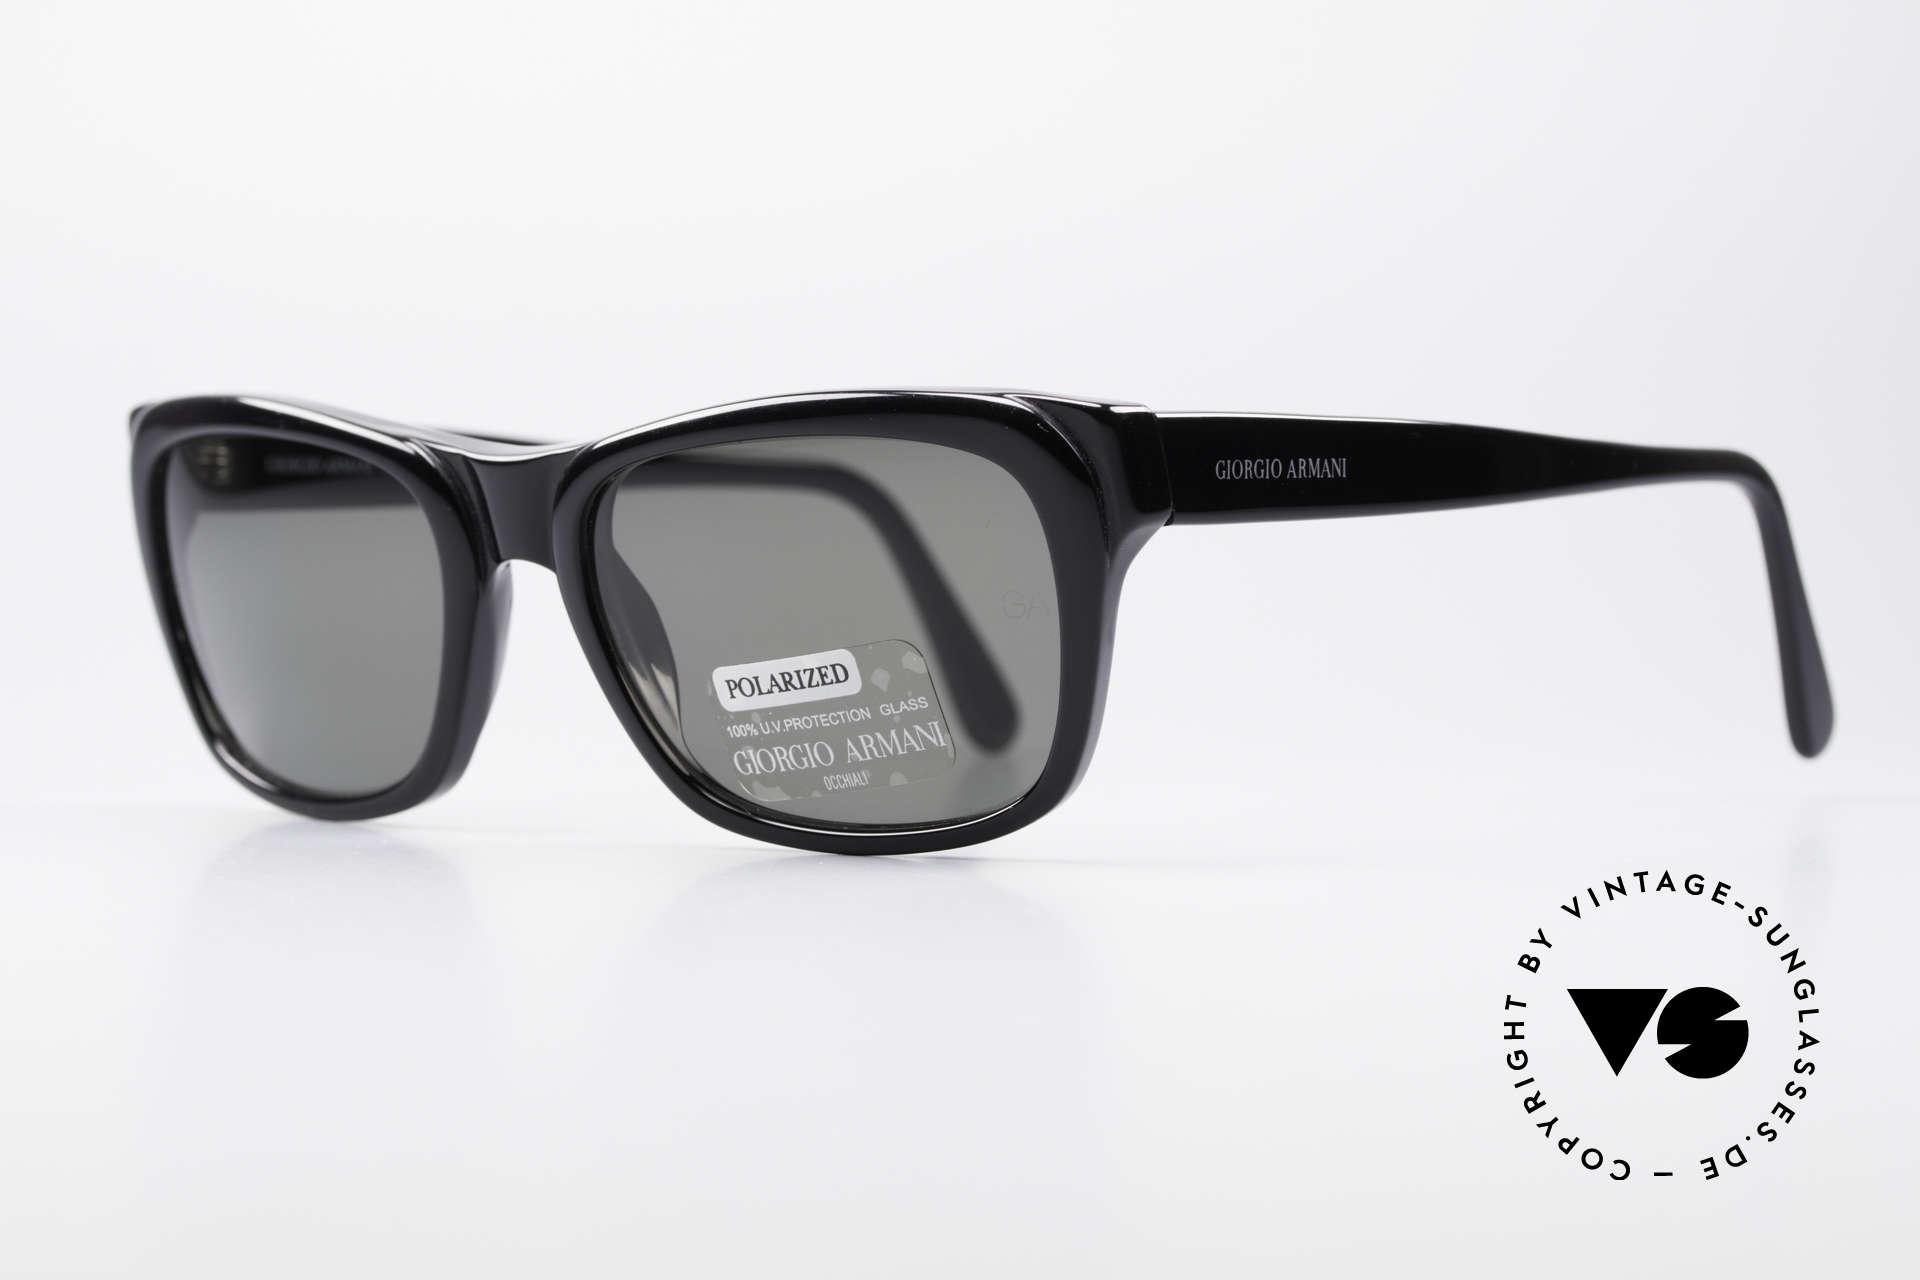 Giorgio Armani 846 90's Designer Shades Polarized, designer piece in TOP quality: mineral glass sun lenses, Made for Men and Women